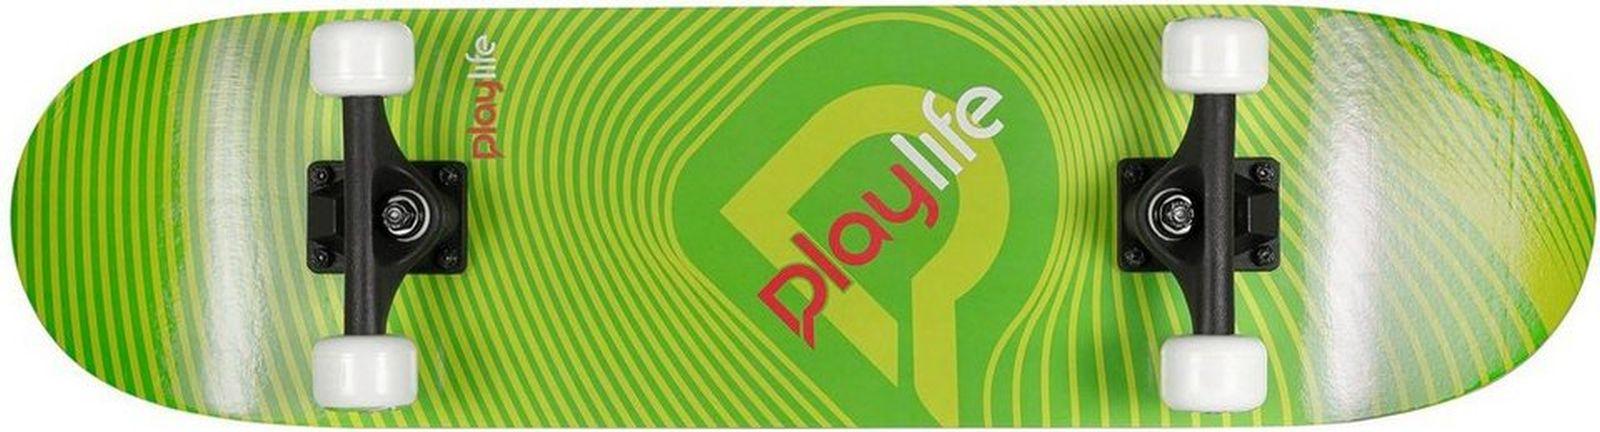 Playlife Illusion Green